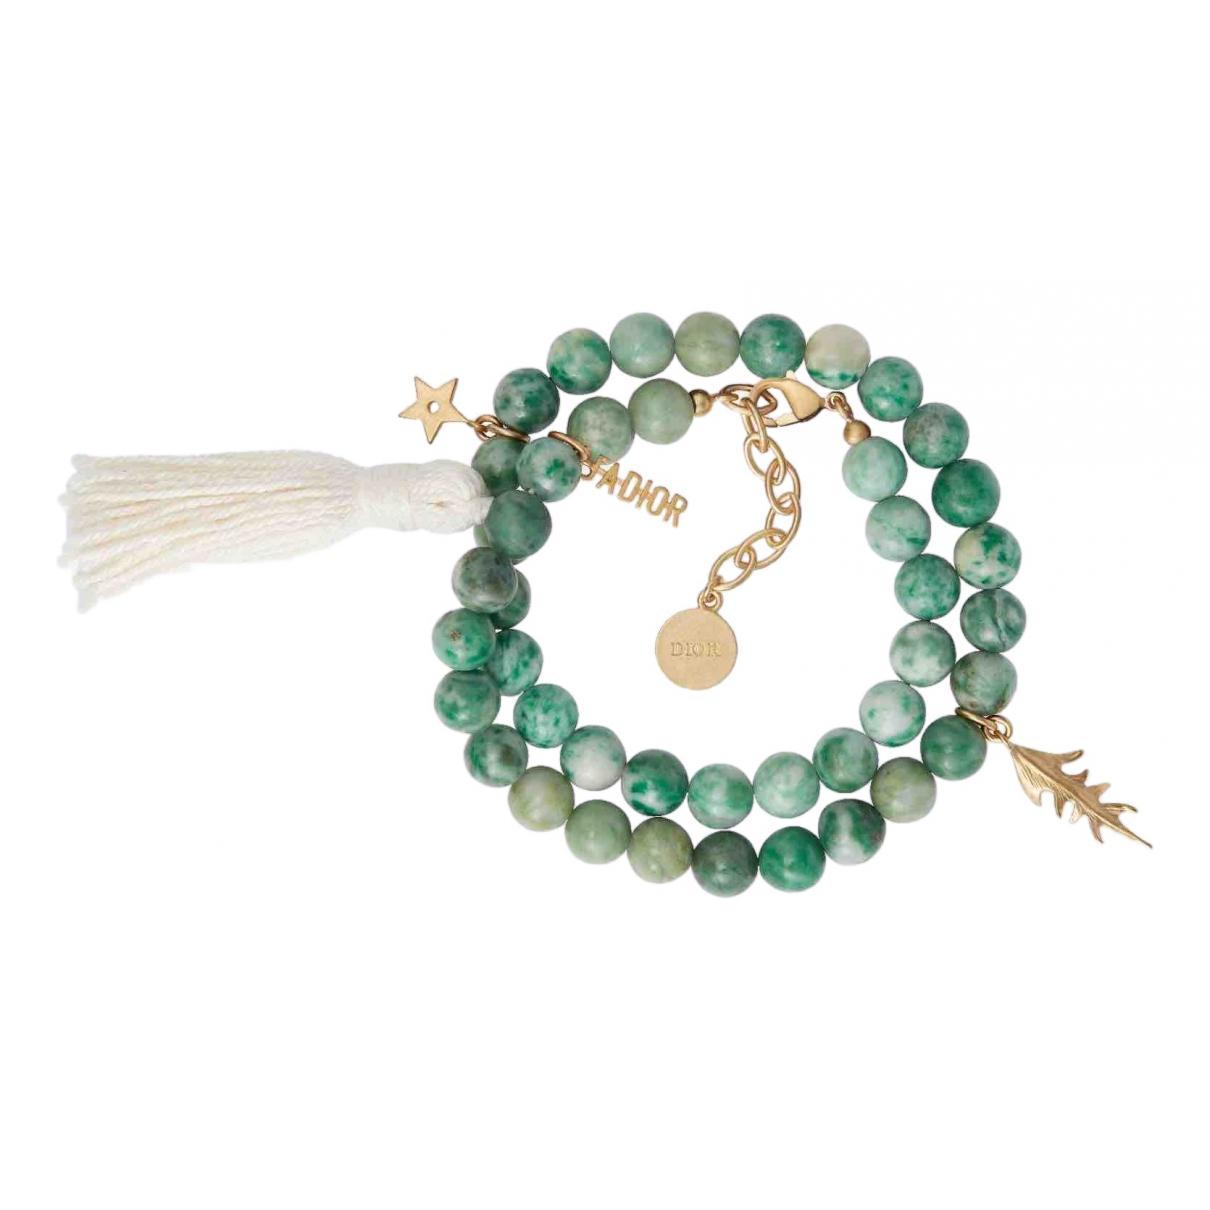 Dior Jadior Armband in  Gruen Jade